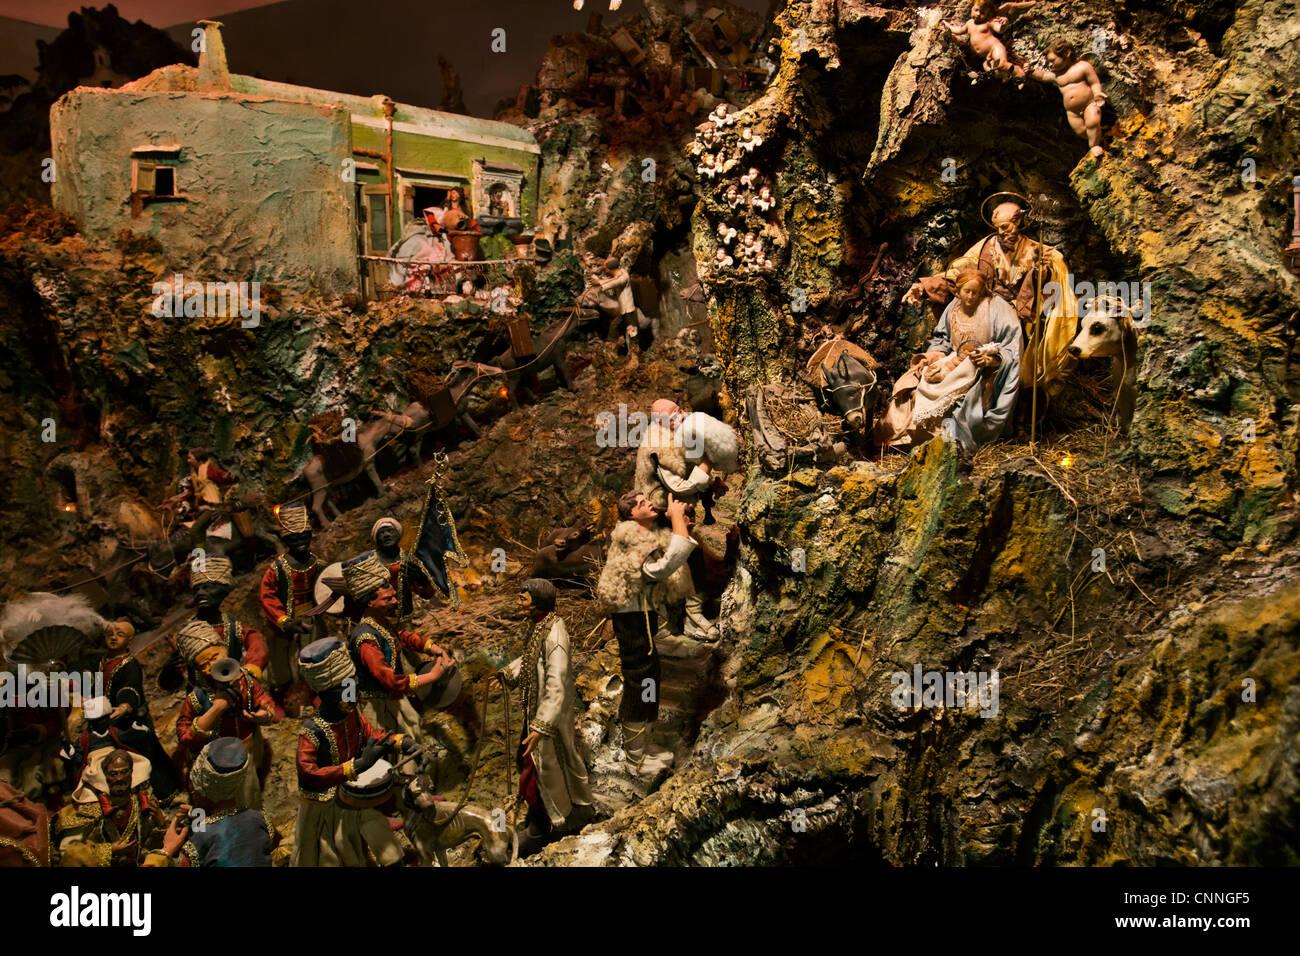 Traditional Neapolitan Nativity set in Ischia Island, Naples, Campania, Italy - Stock Image